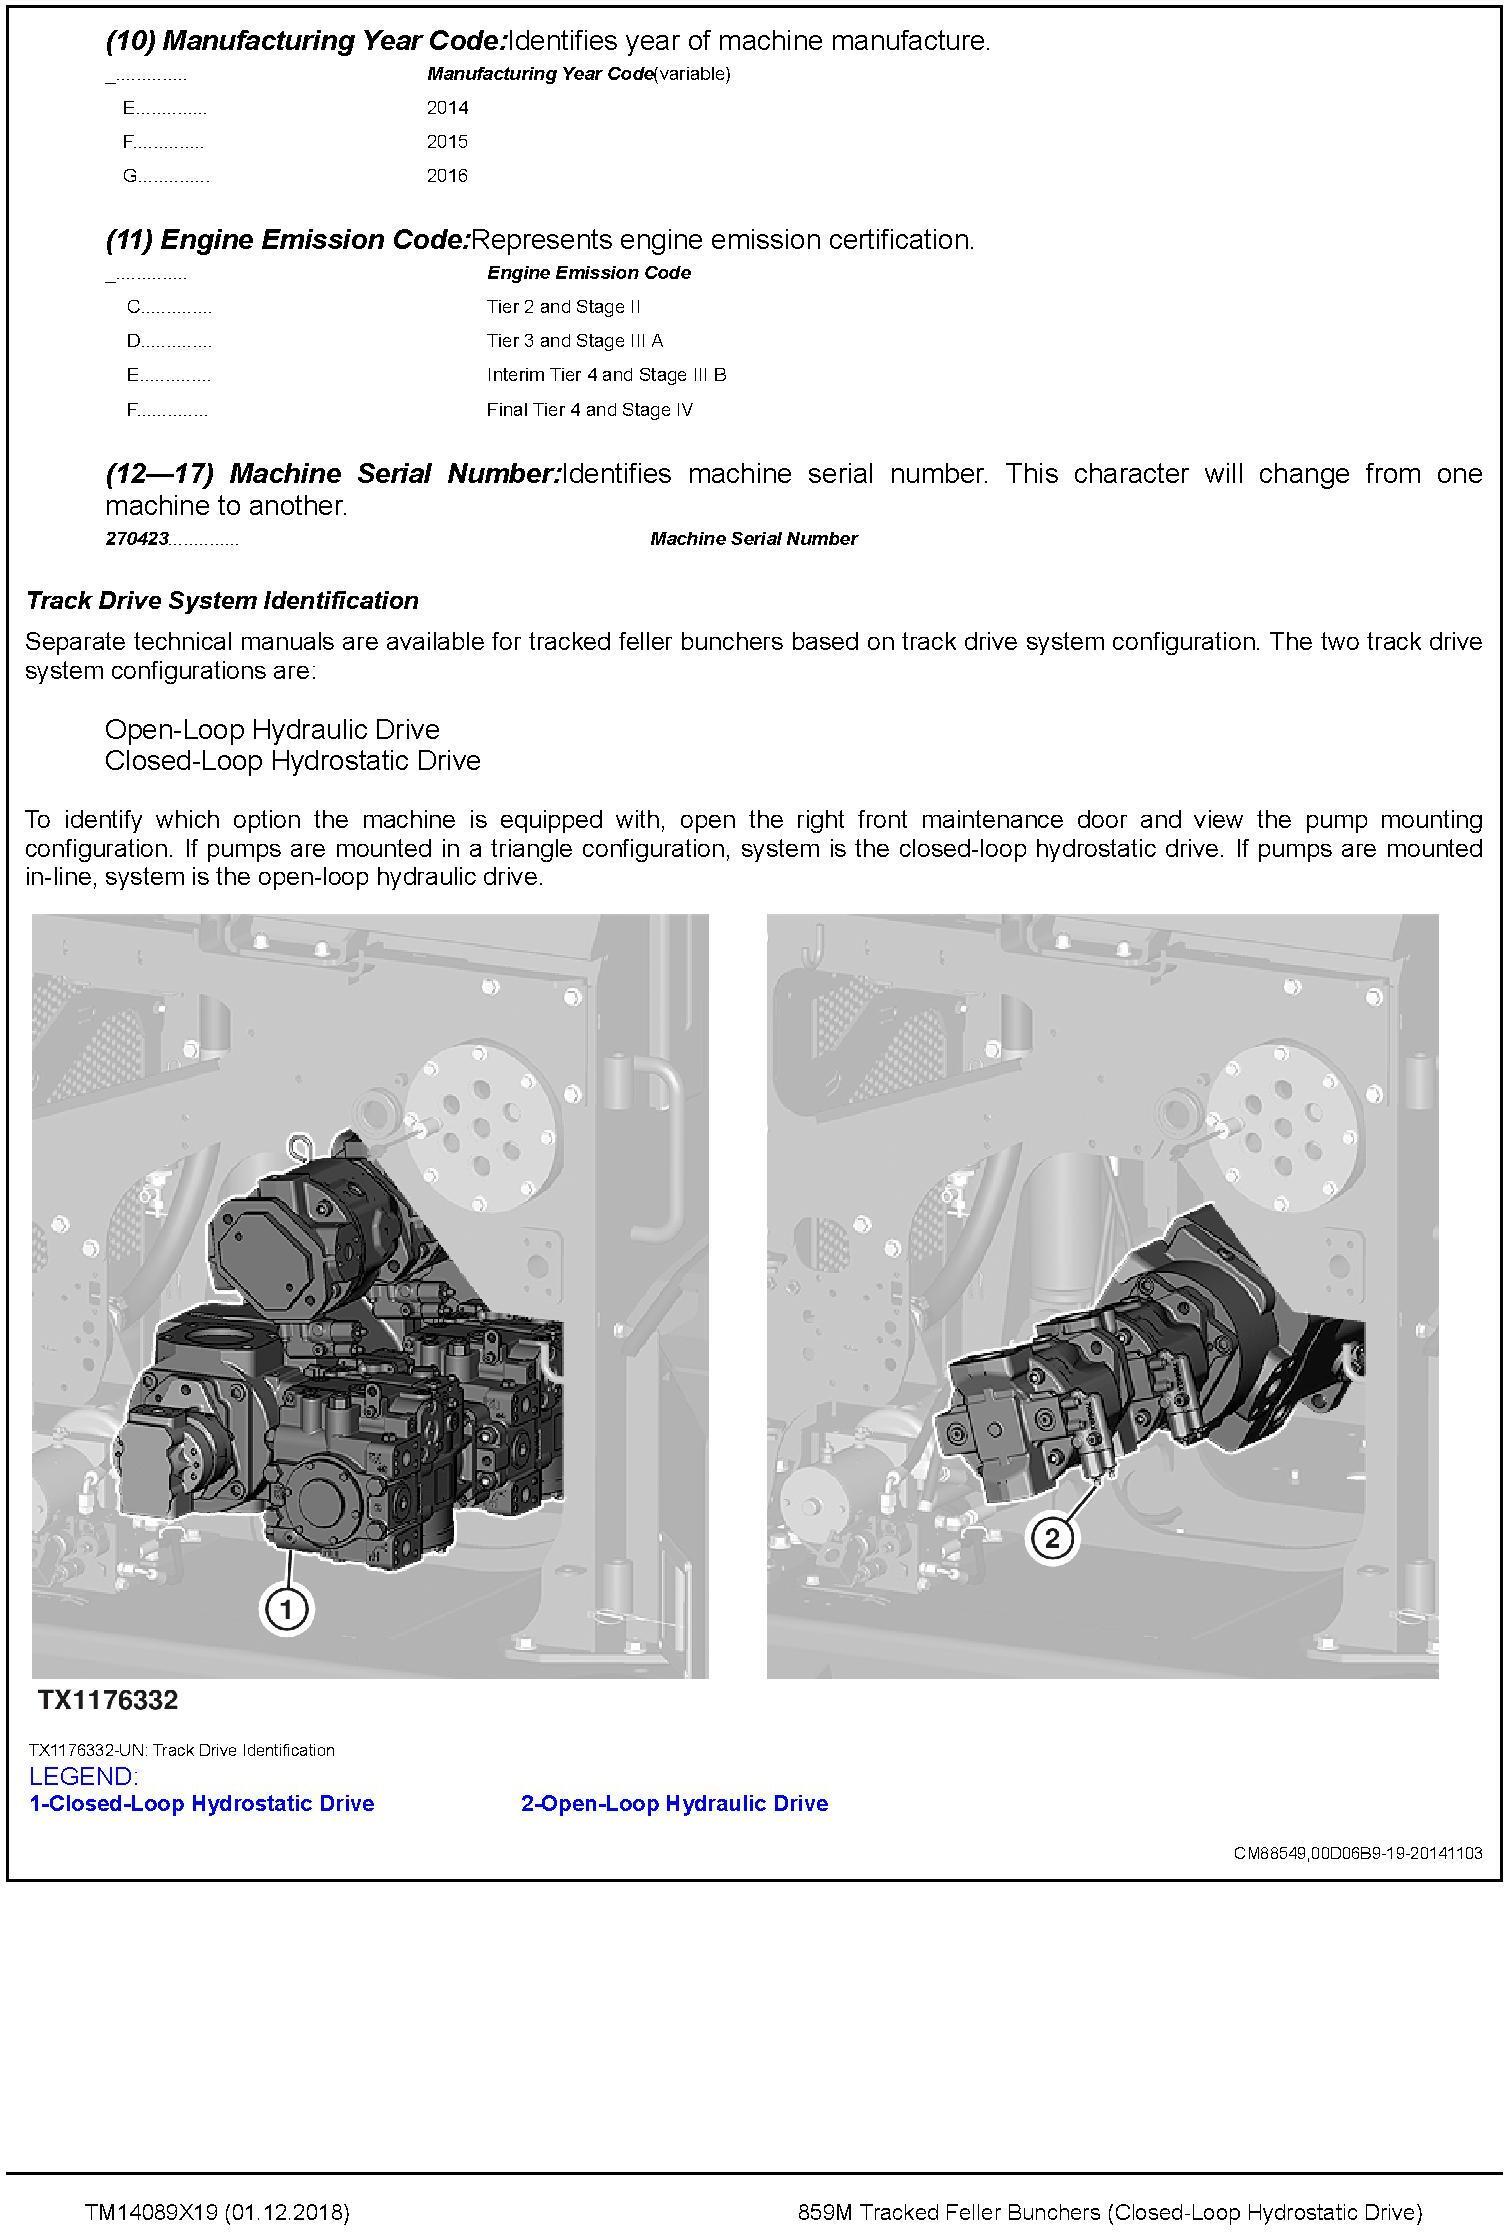 John Deere 859M (SN. F293917-,L343918-) Feller Bunchers (Closed-Loop) Diagnostic Manual (TM14089X19) - 1